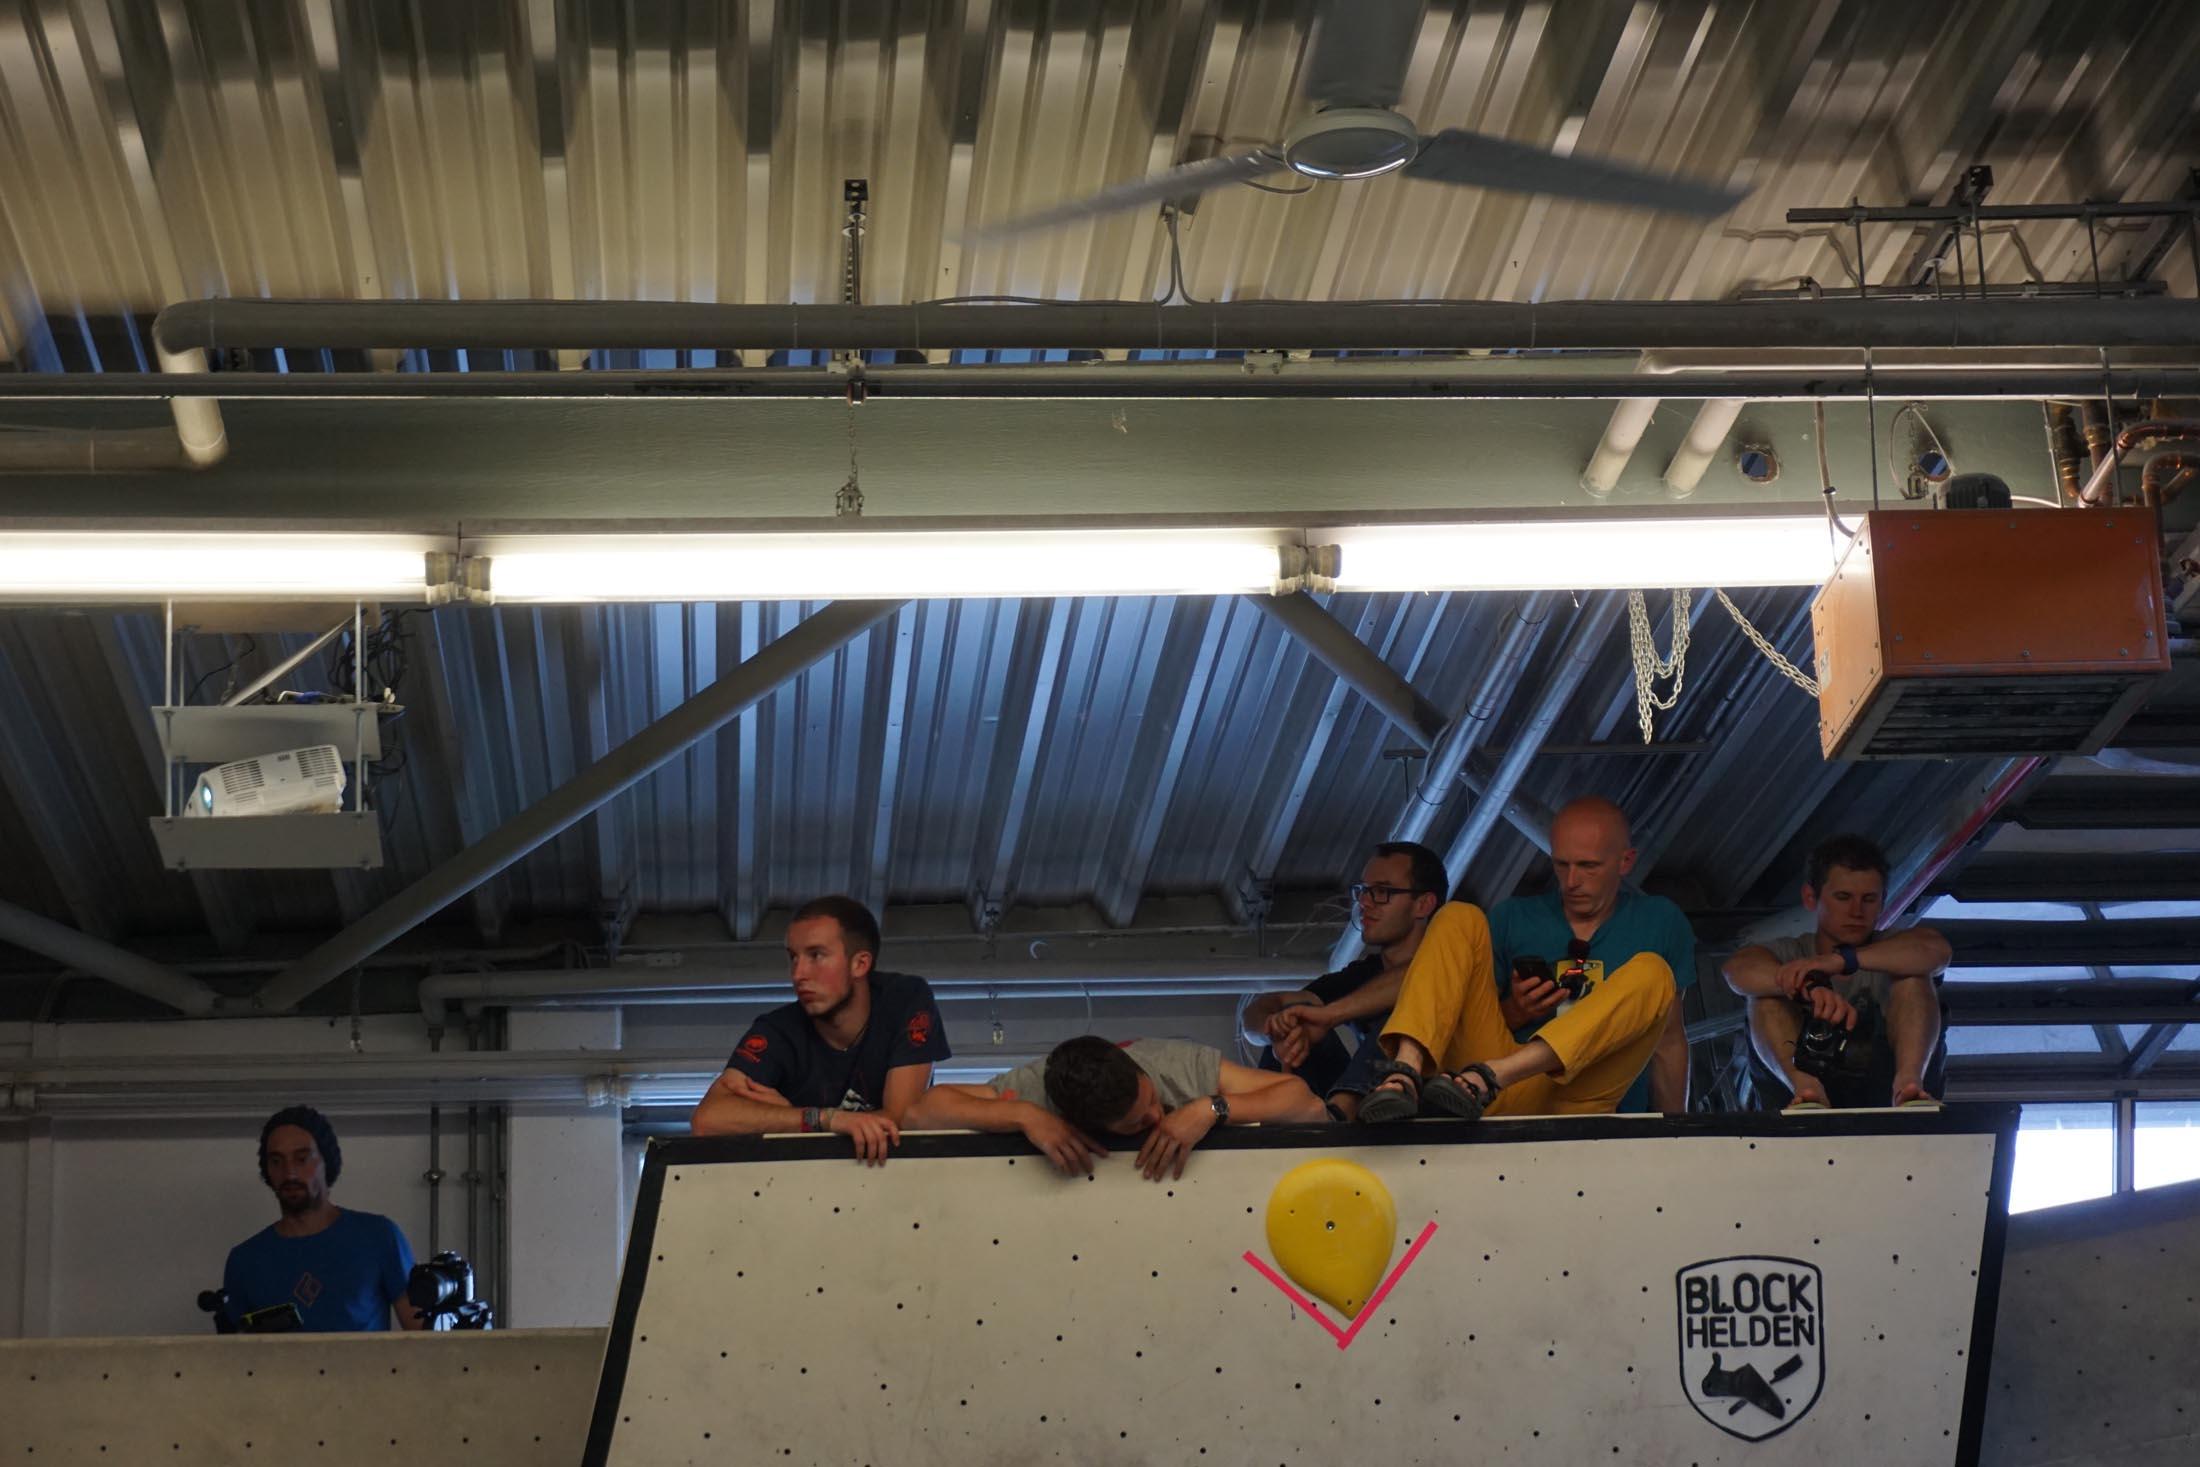 Finale, internationaler bouldercup Frankenjura 2016, BLOCKHELDEN Erlangen, Mammut, Bergfreunde.de, Boulderwettkampf07092016578